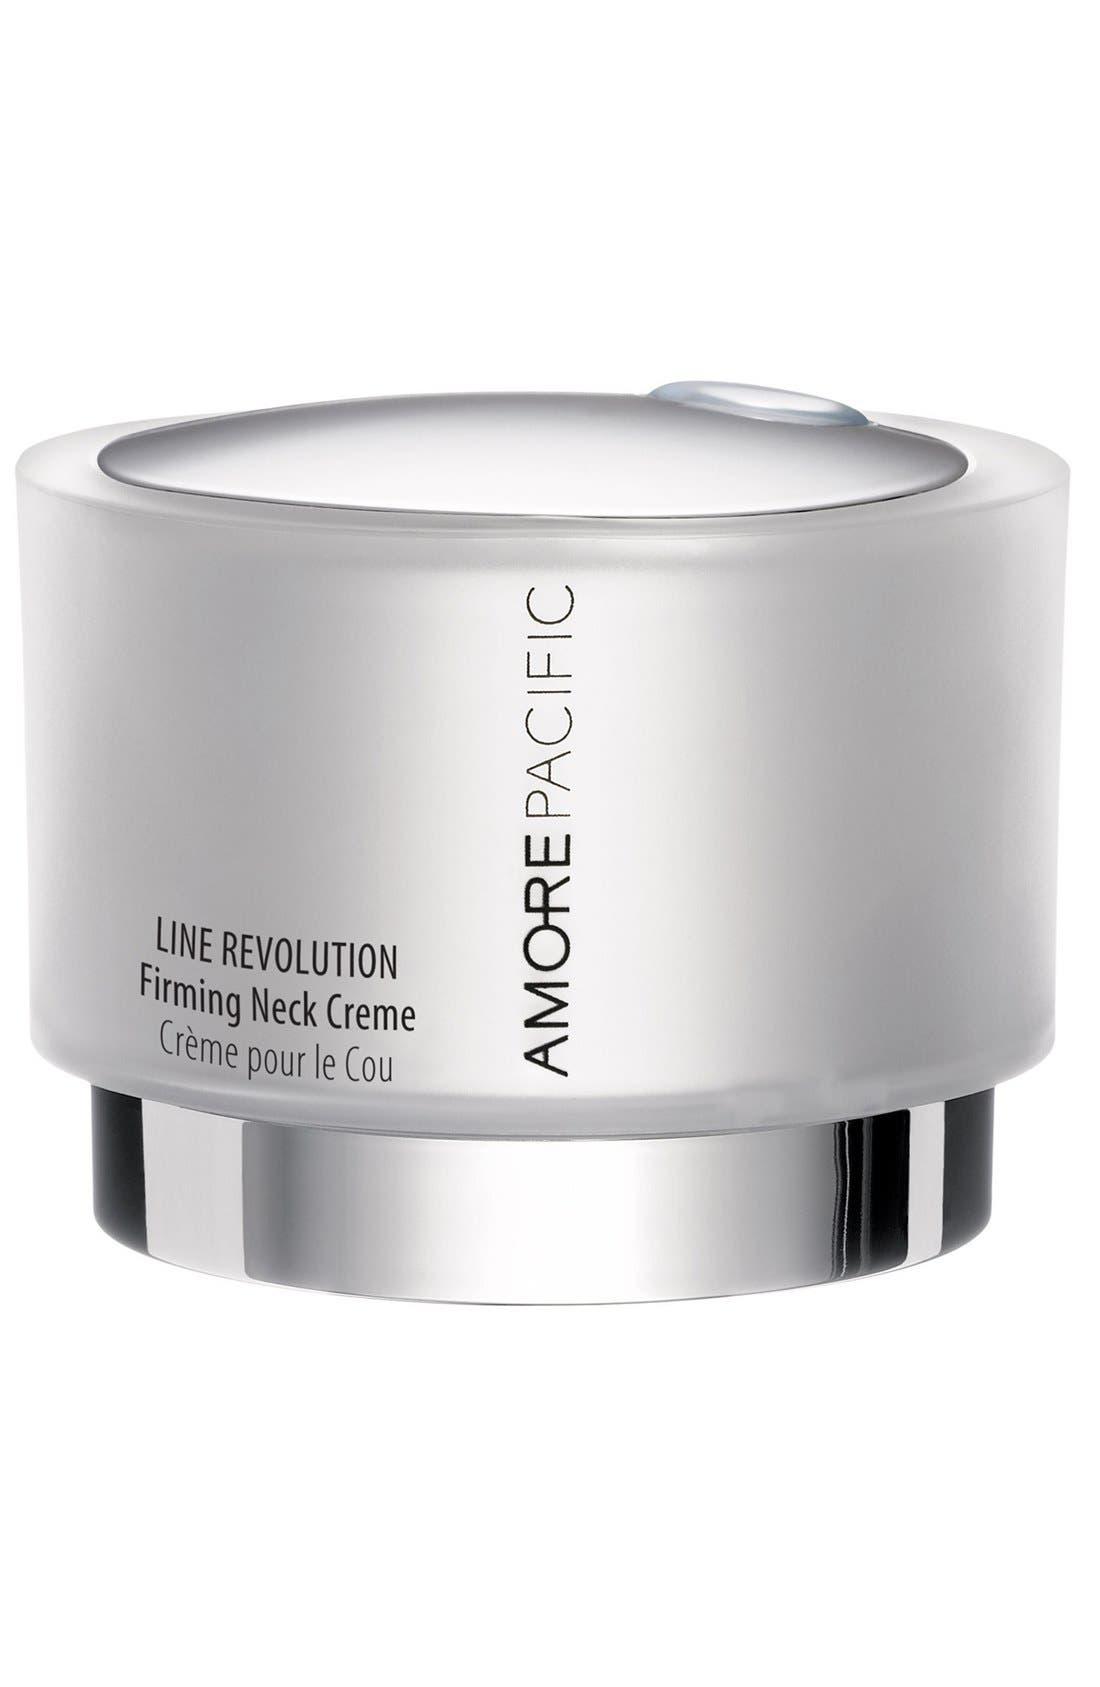 AMOREPACIFIC 'Line Revolution' Firming Neck Crème